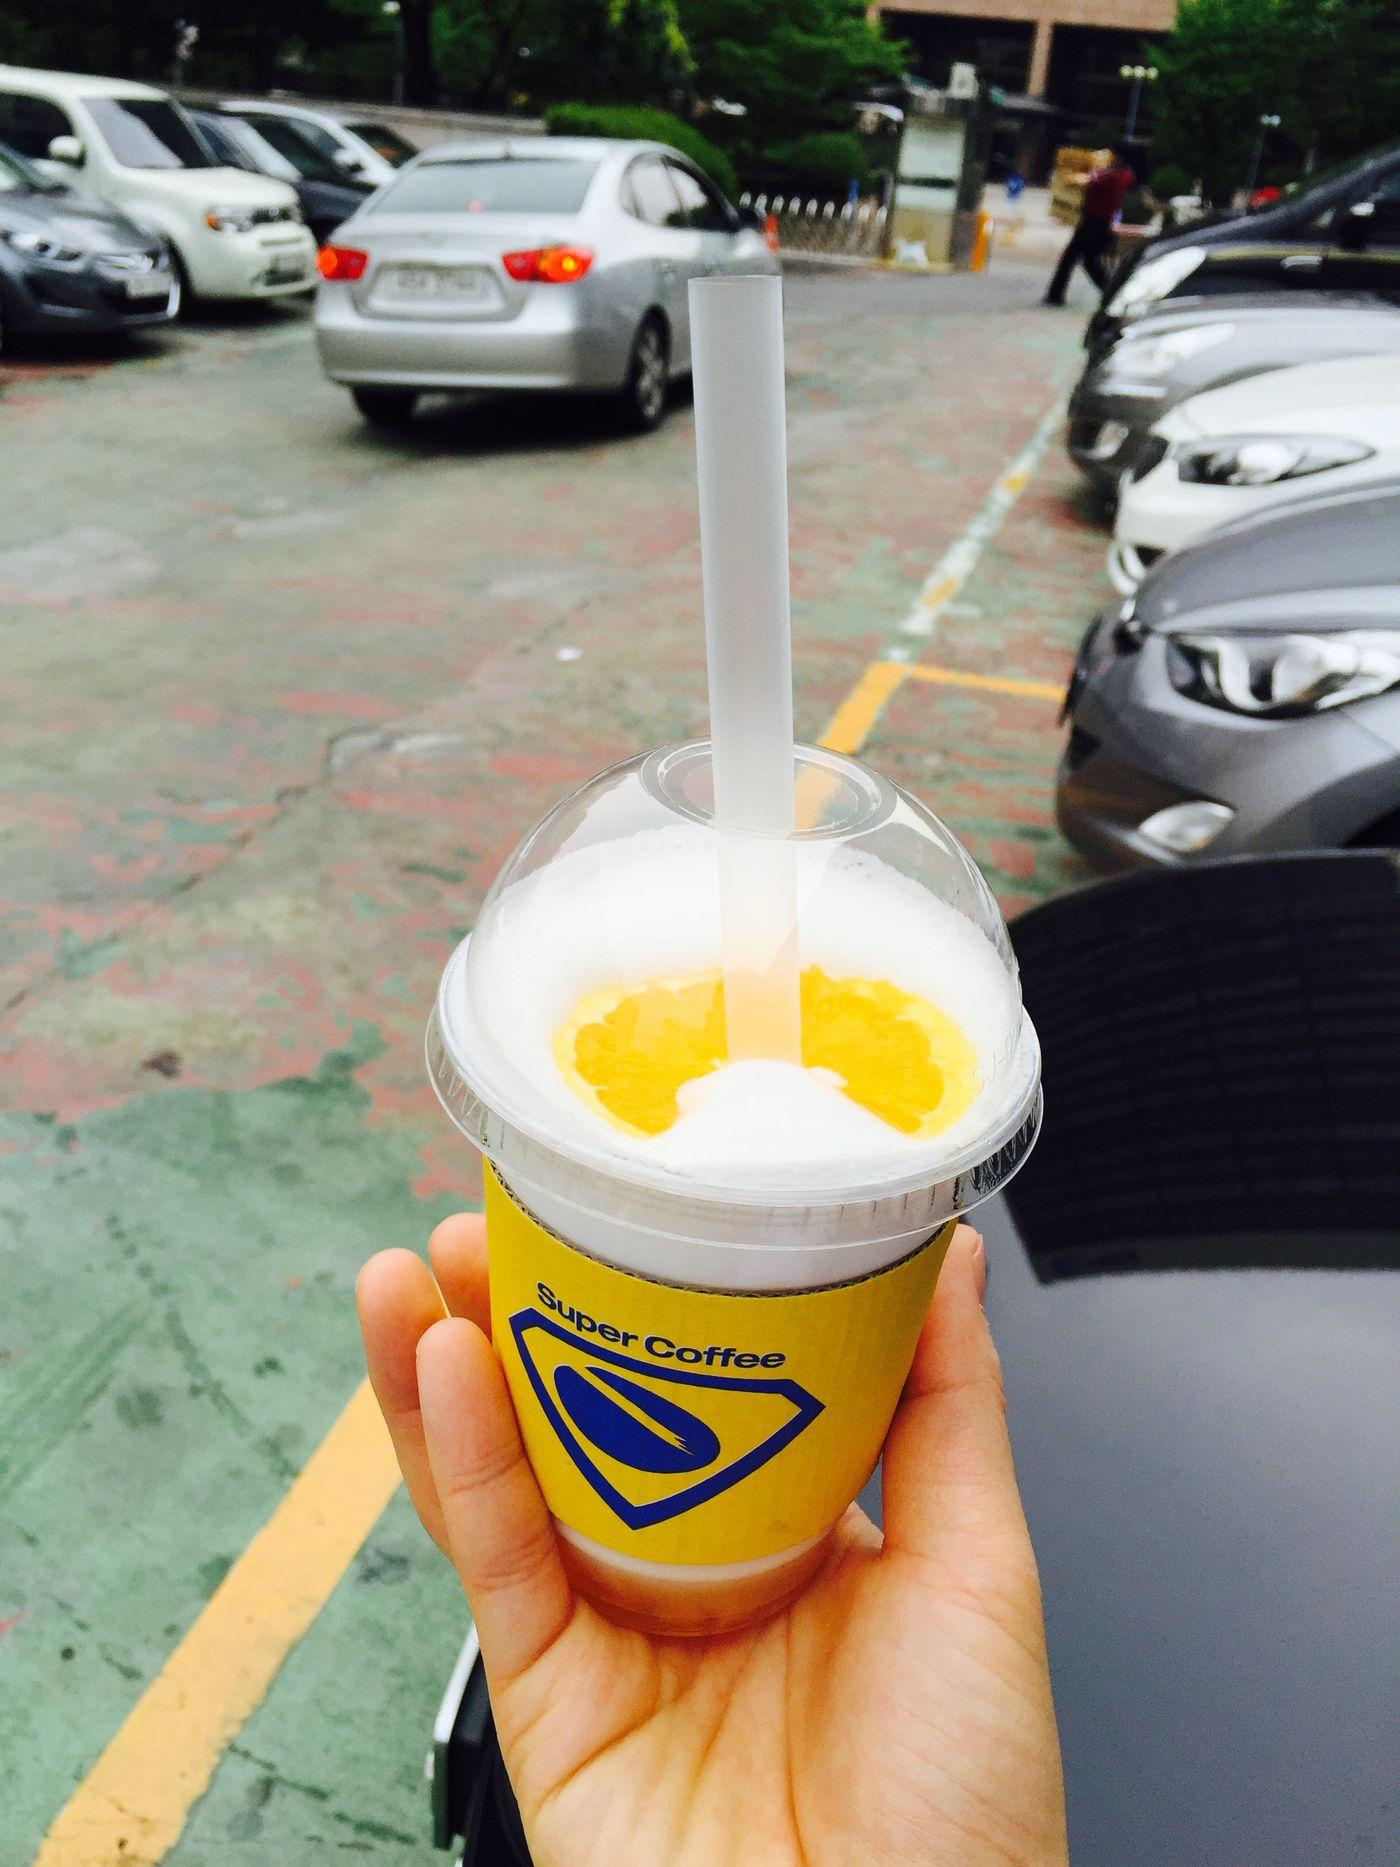 Super Coffee Ice Coffee Orange Coffee